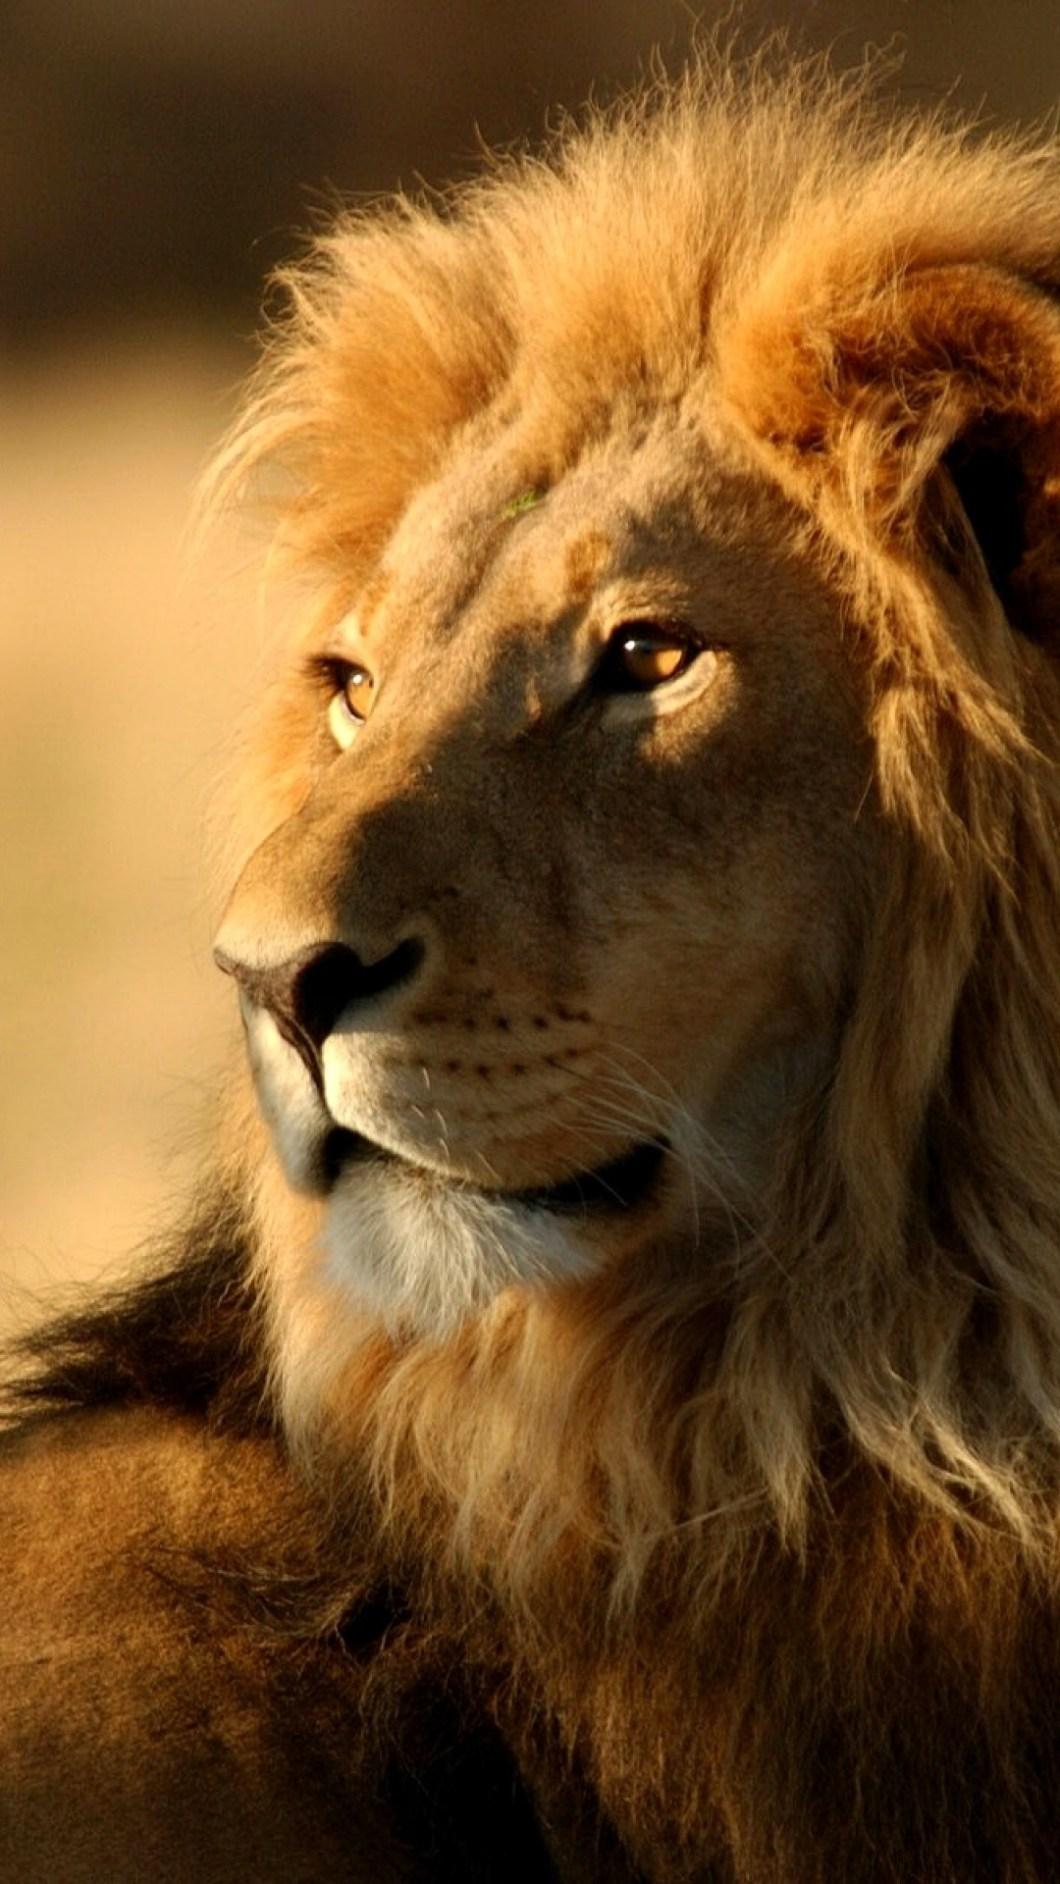 lion wallpaper hd 1080p iphone | gendiswallpaper